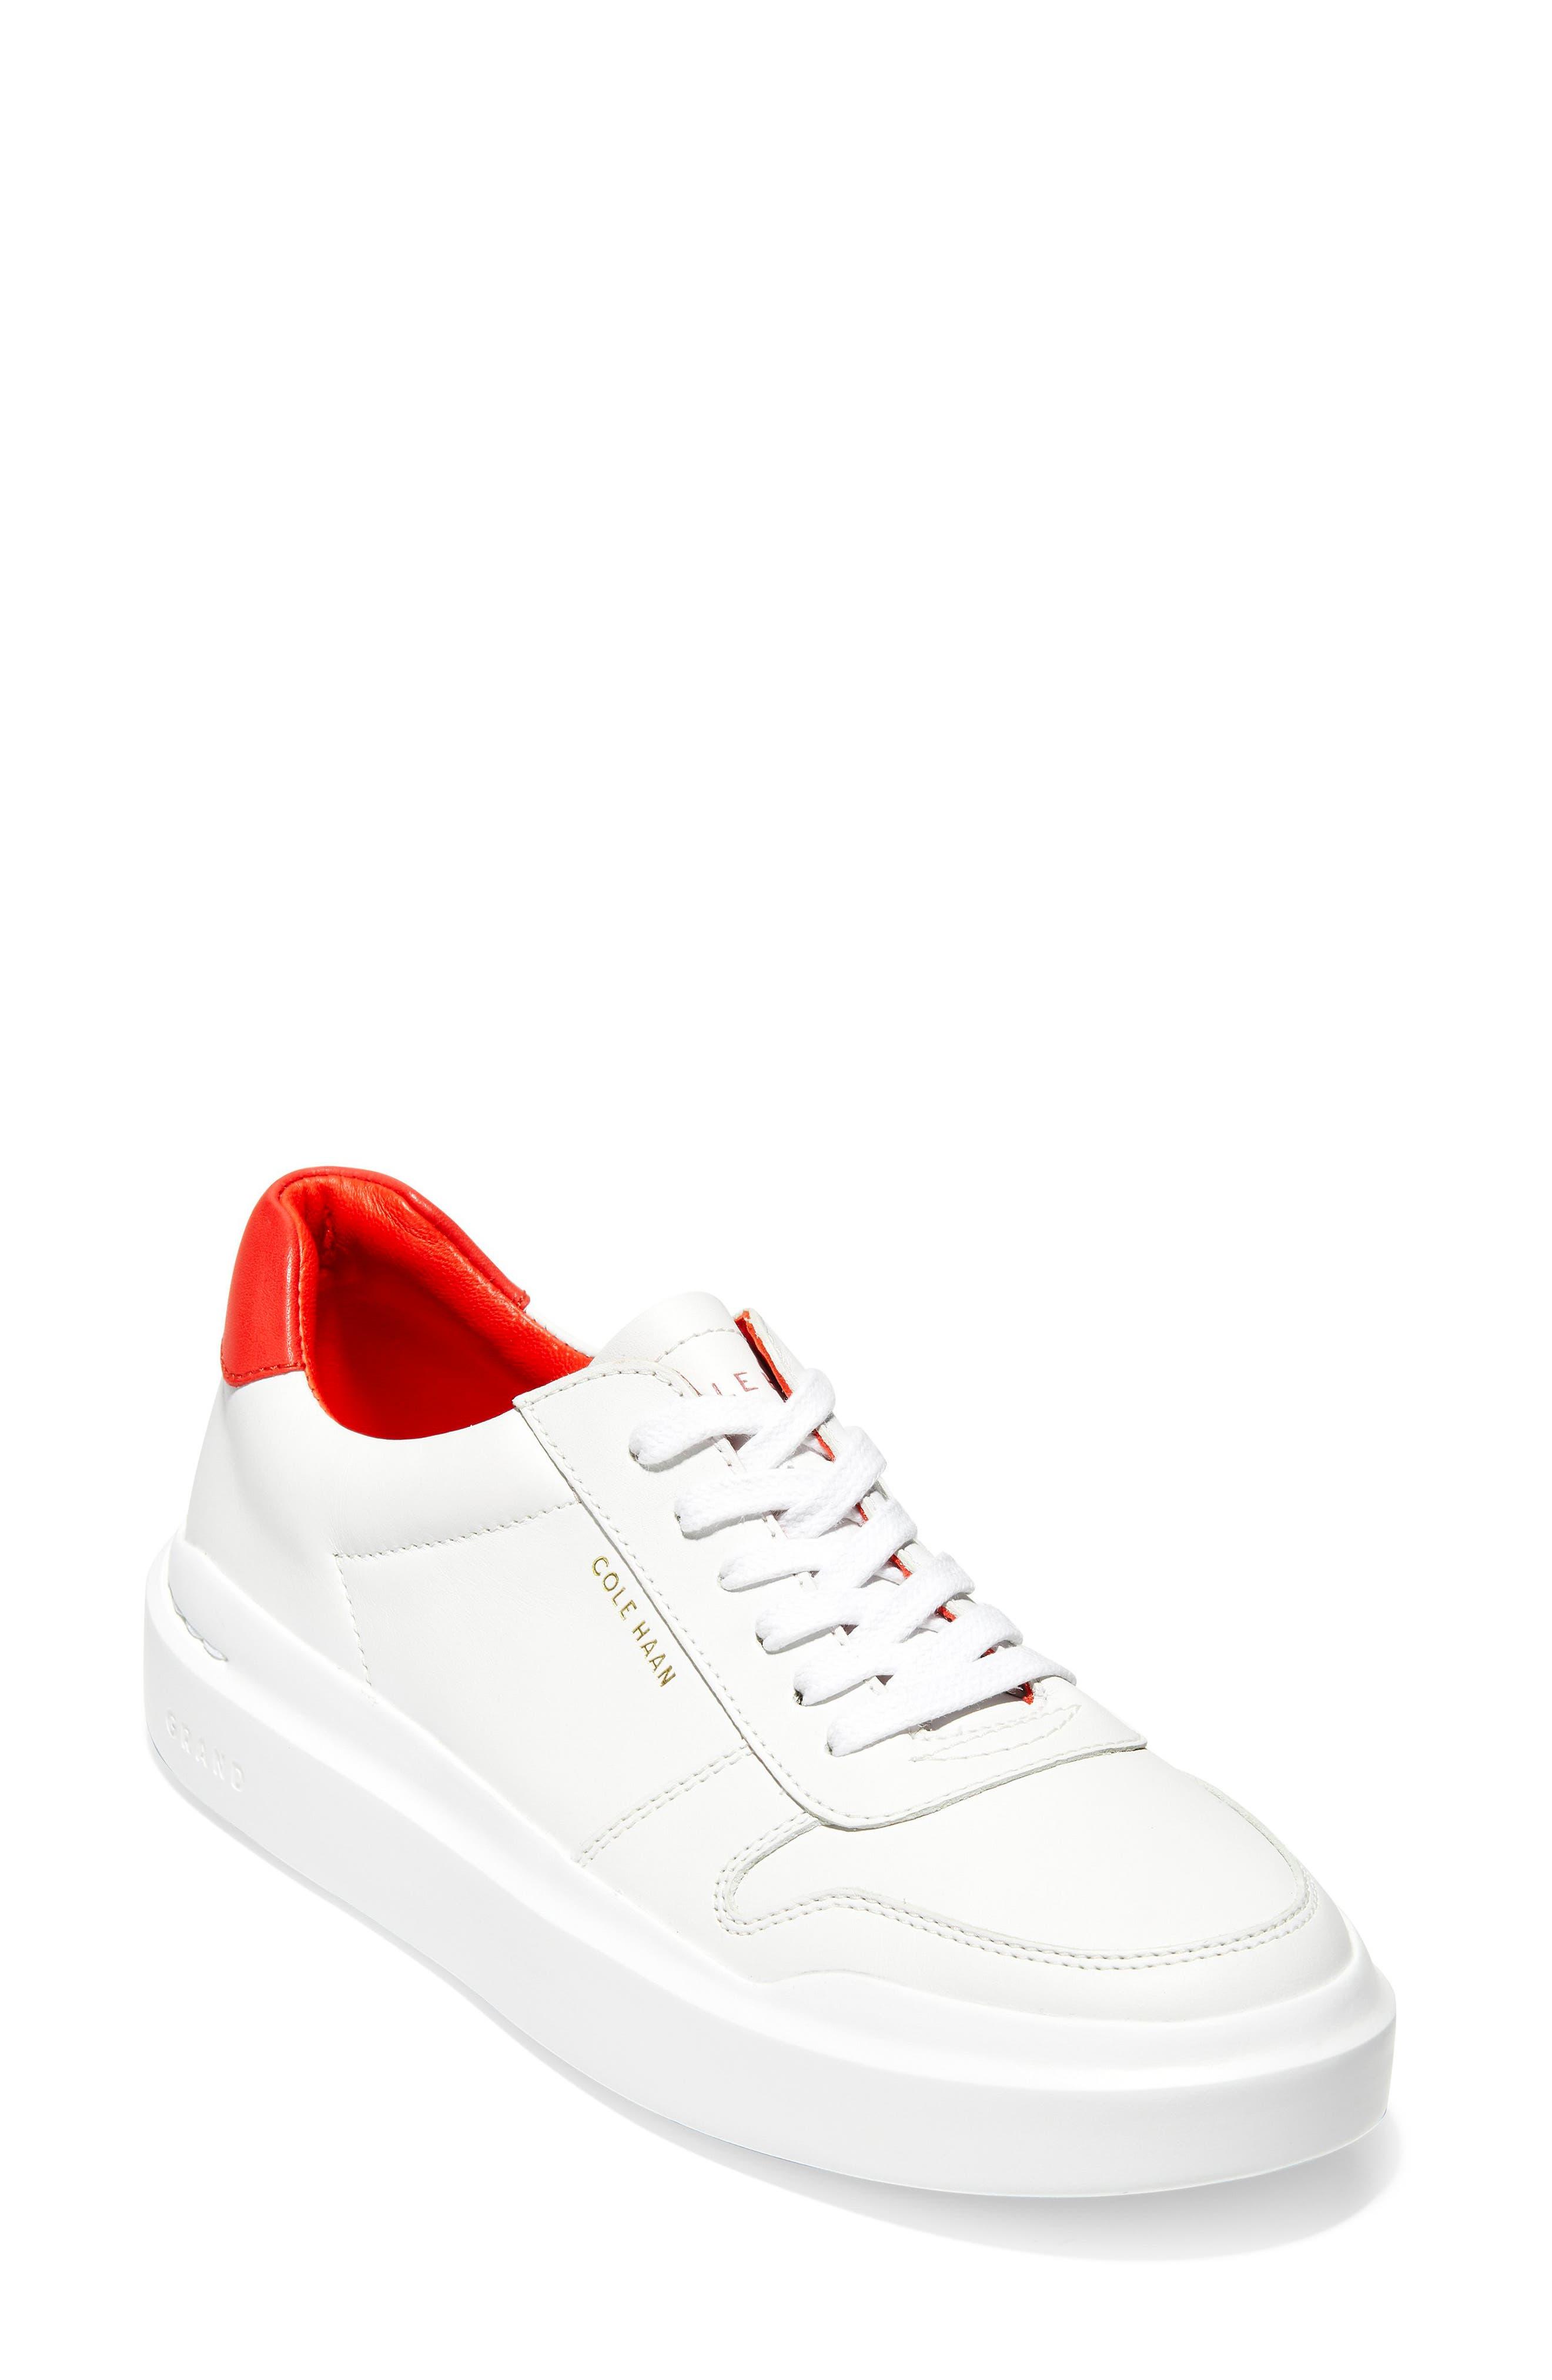 Sneakers Cole Haan Shoes   Nordstrom